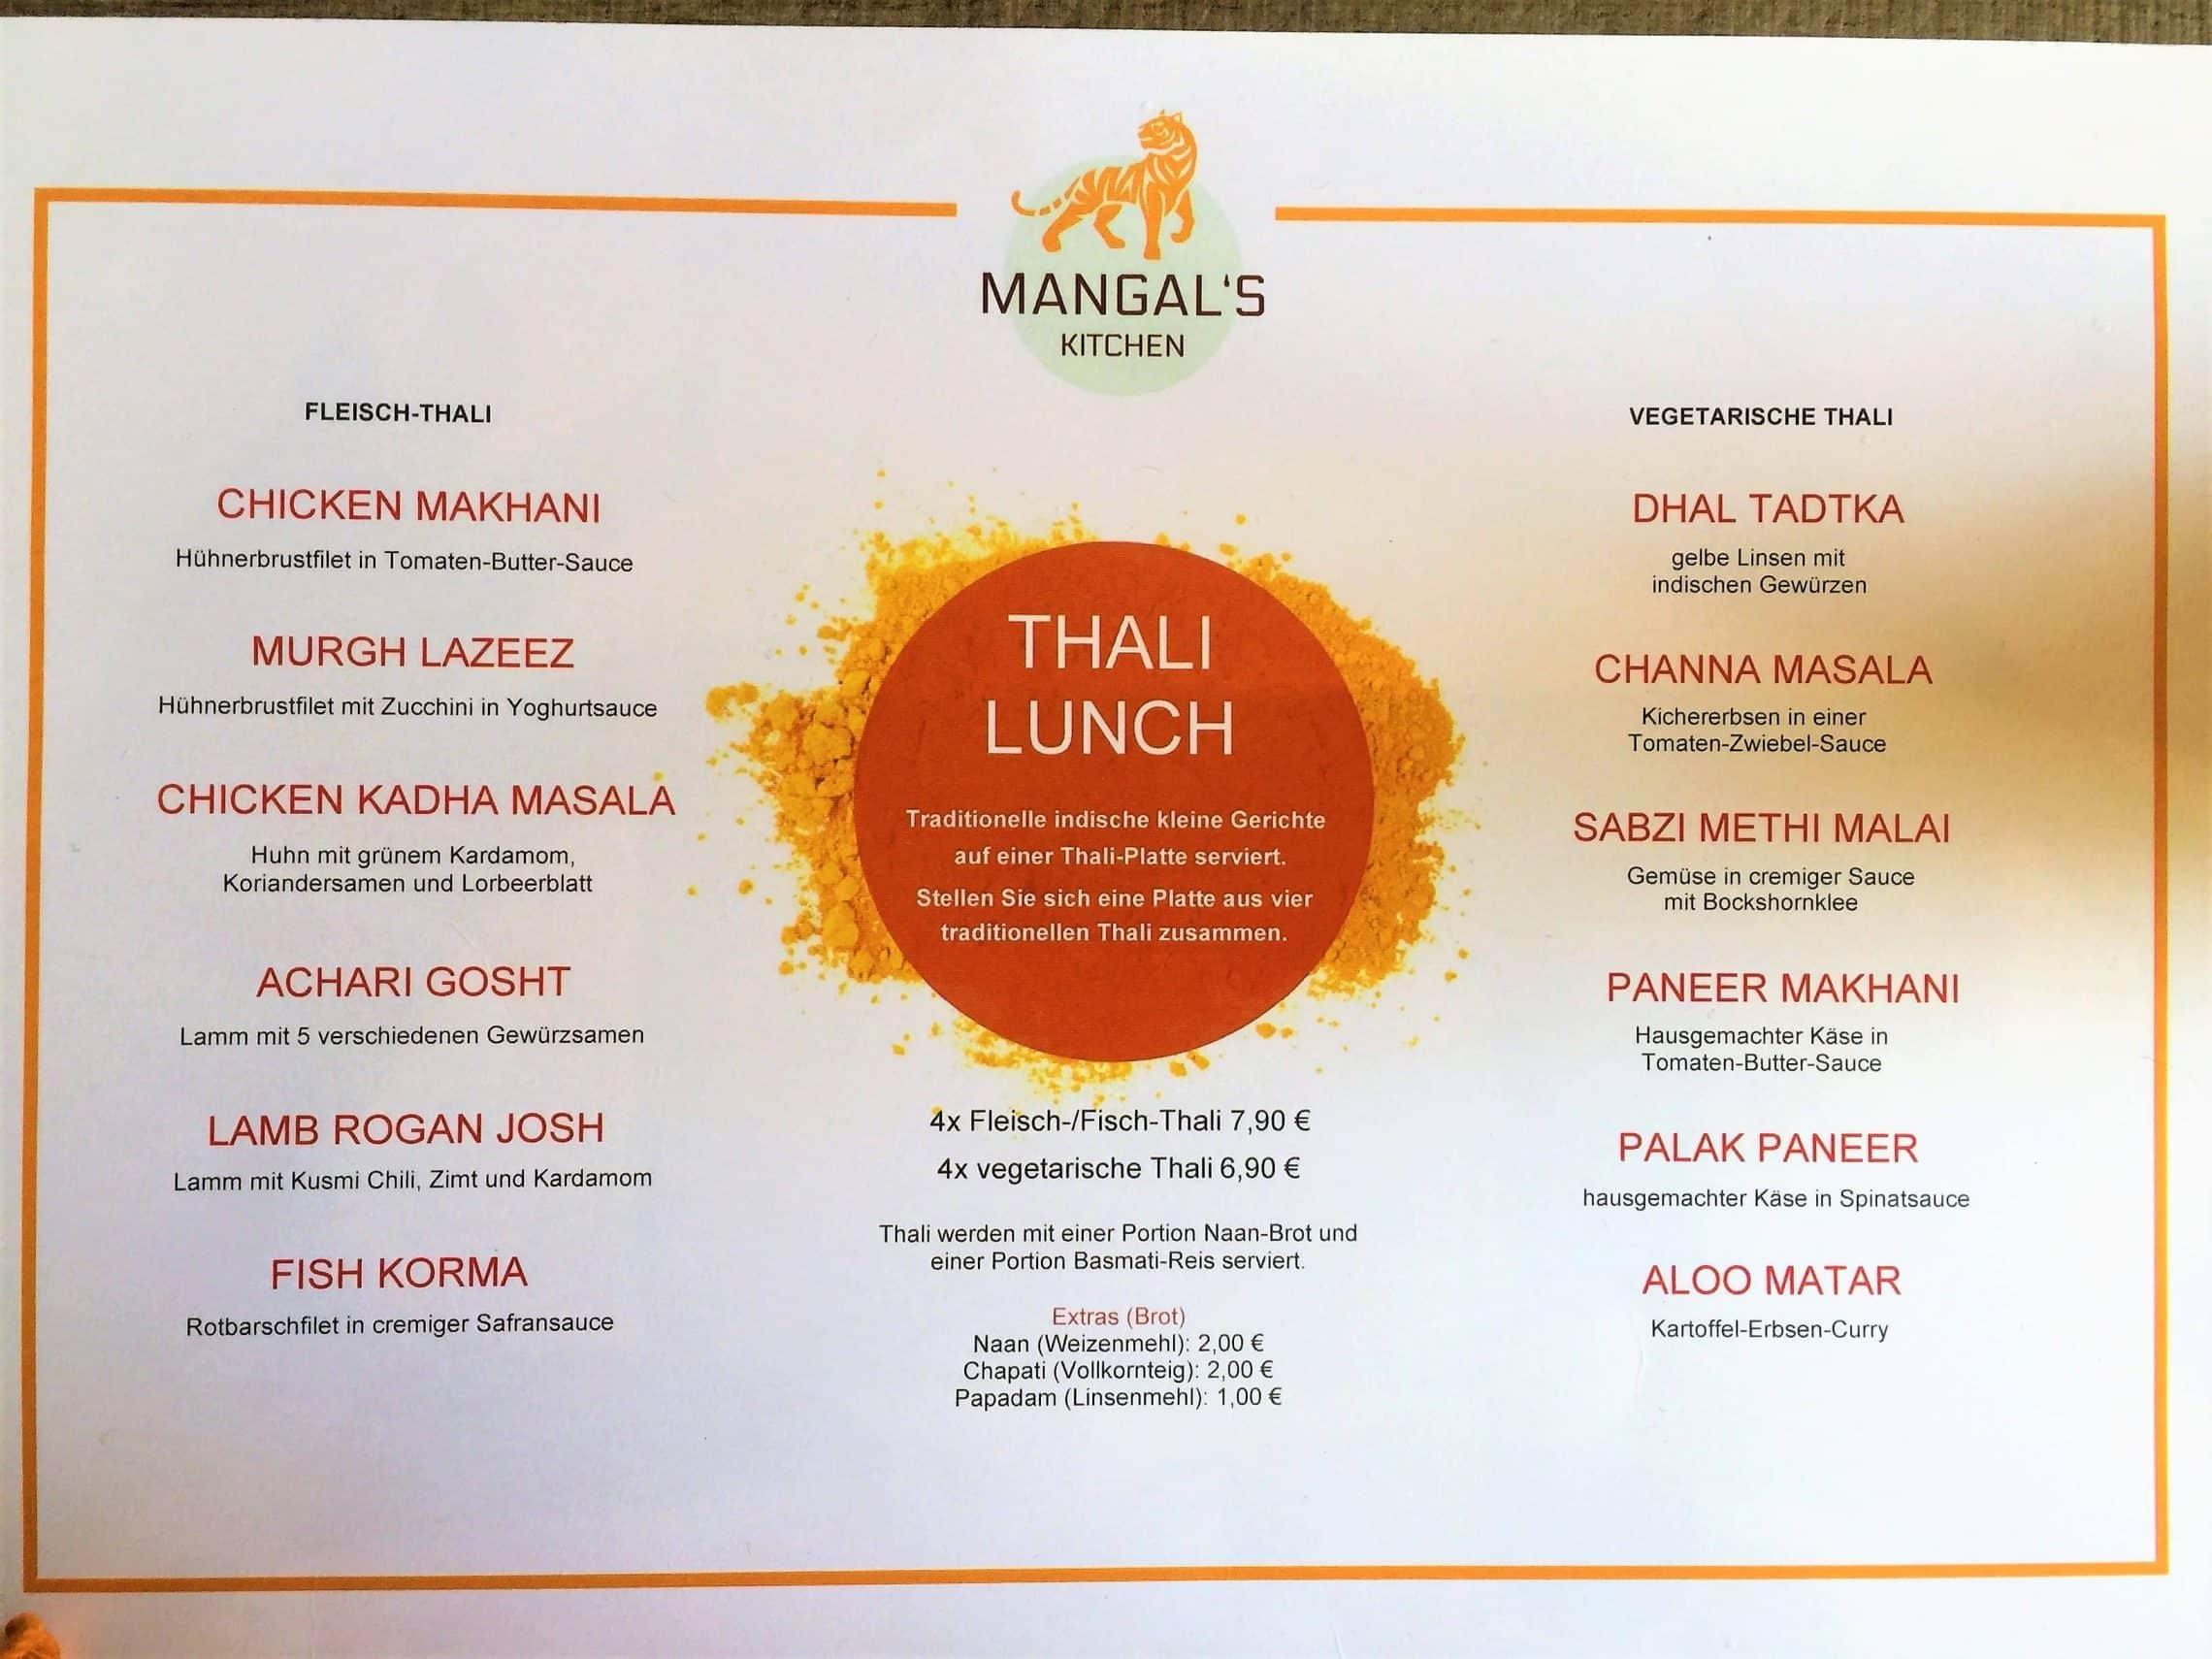 Style Hannover Mangals Kitchen Speisekarte Mittag - Thali Lunch in Mangal's Kitchen